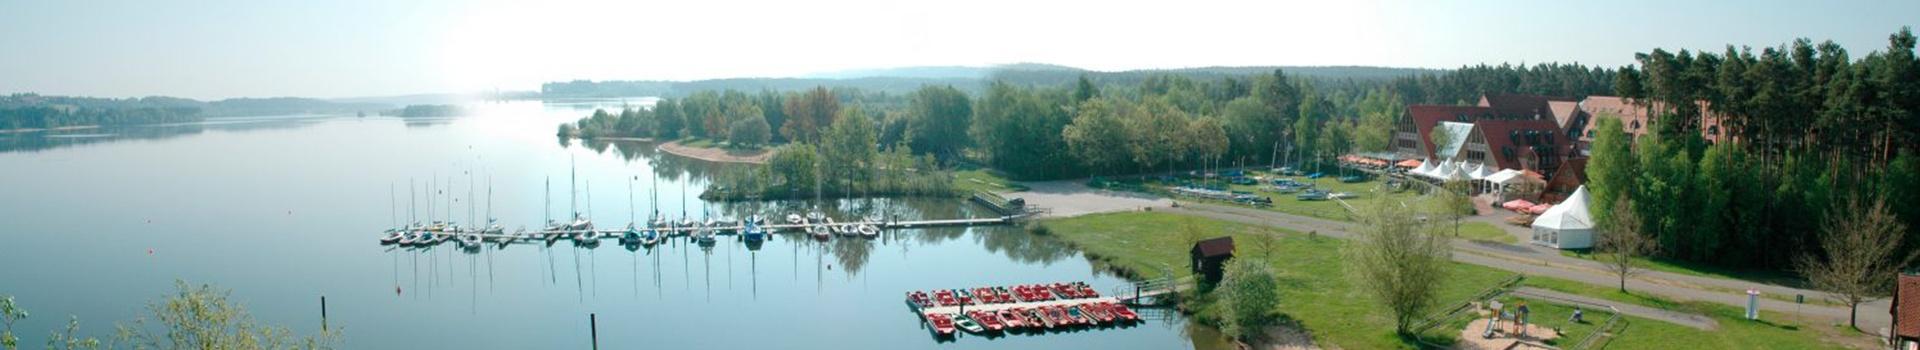 Panorama Aktivresort Strandhotel Seehof am Kleinen Brombachsee